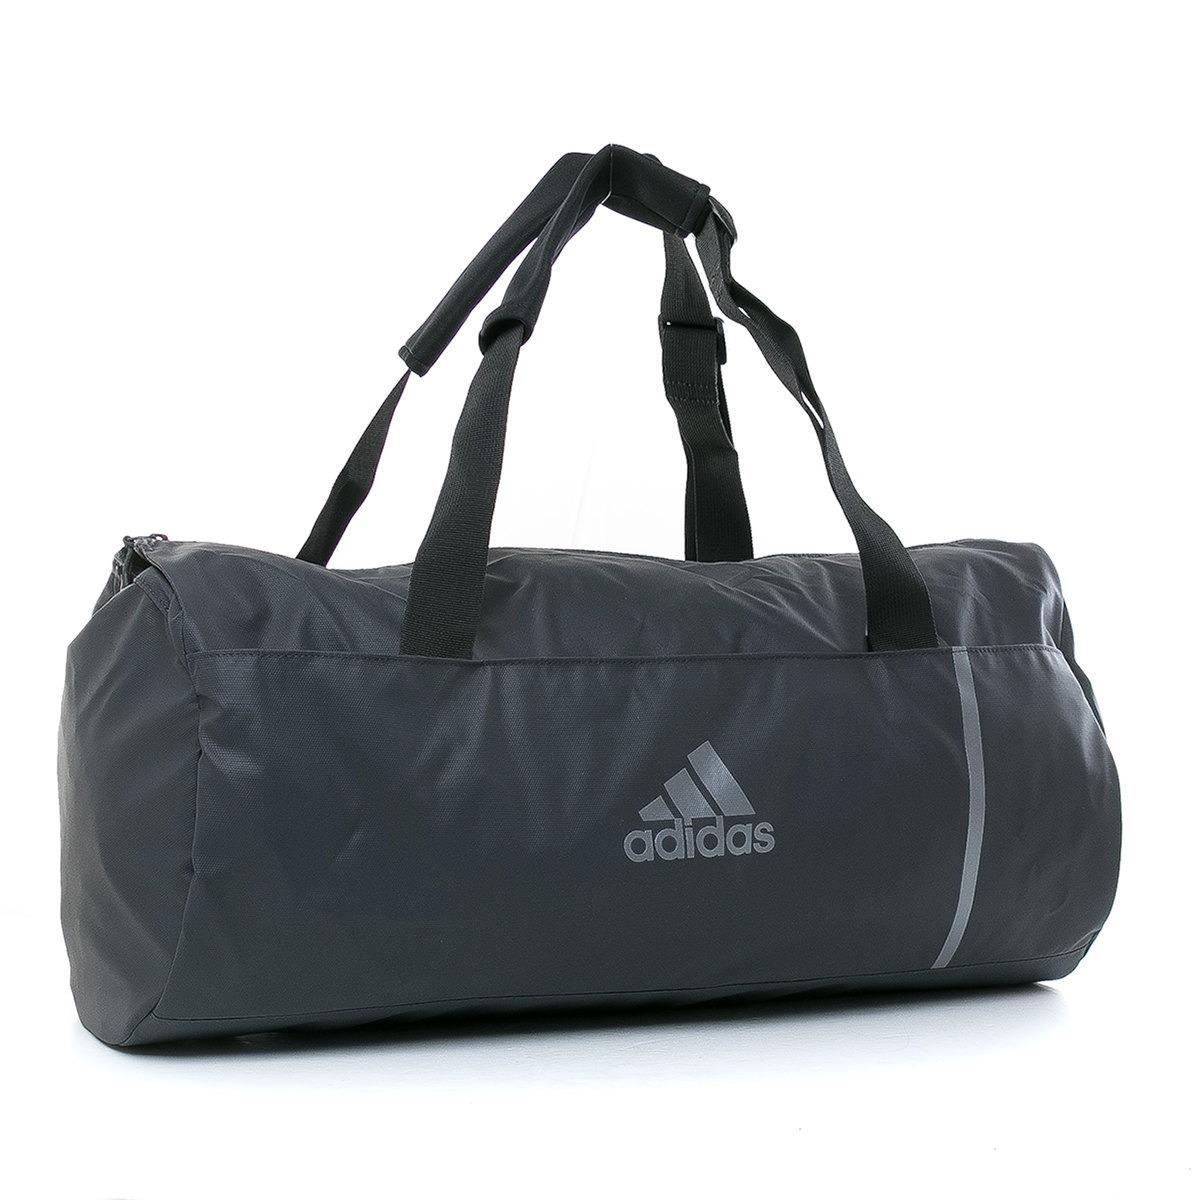 Bolso Negro En Convertible Libre Mediano 199 Adidas2 00 Mercado cA3jRL54q